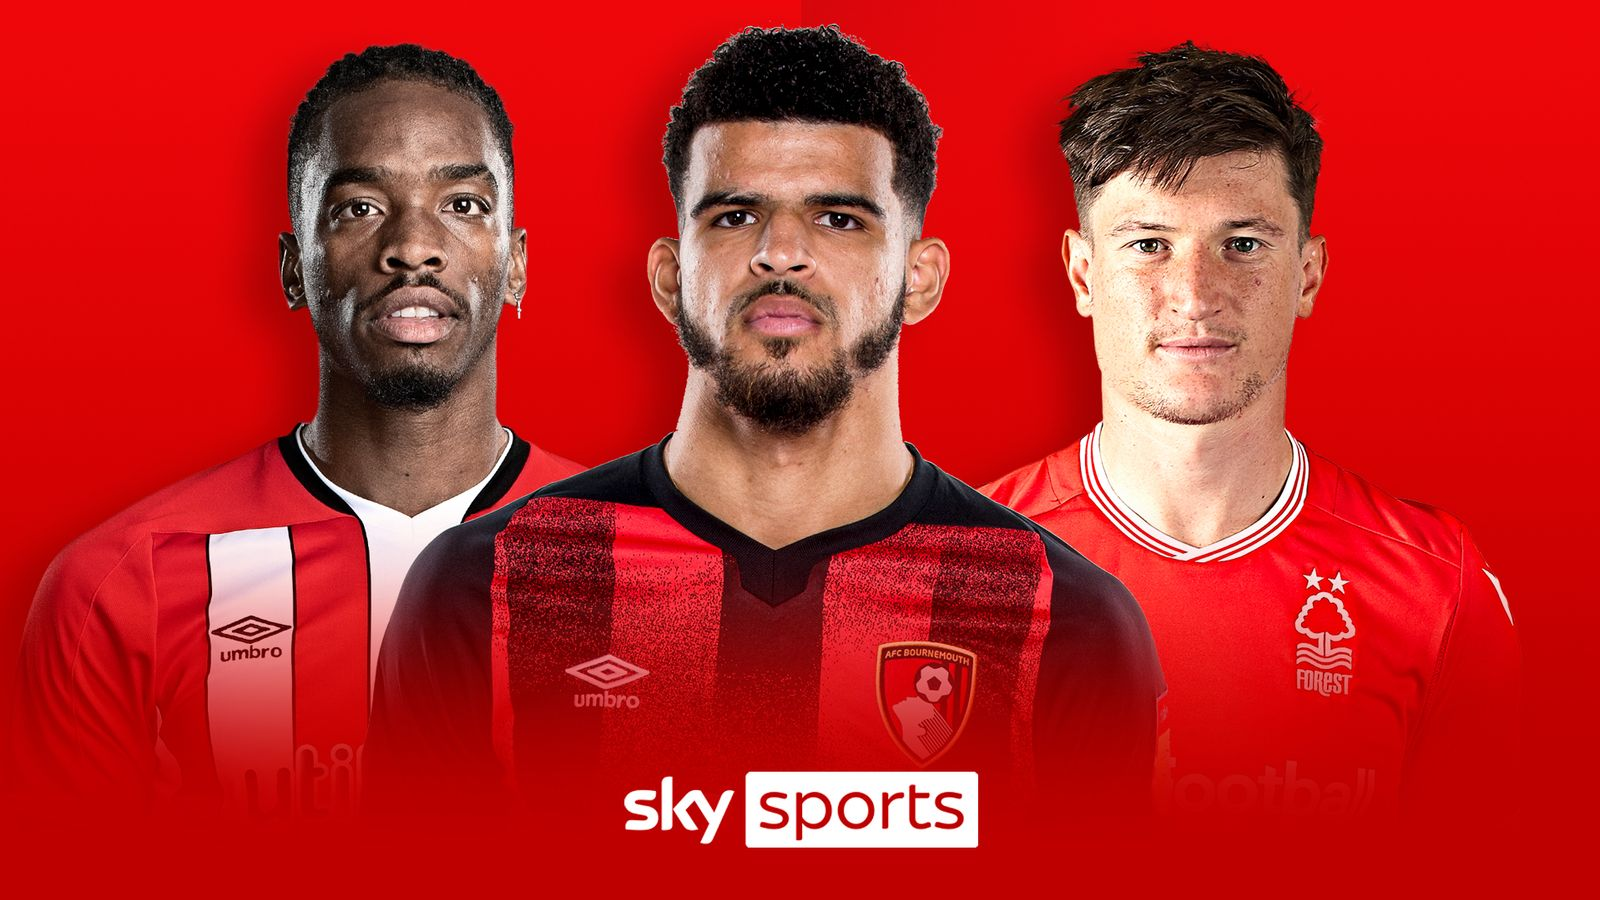 2020/21 Sky Bet EFL season: December fixture schedule on Sky Sports